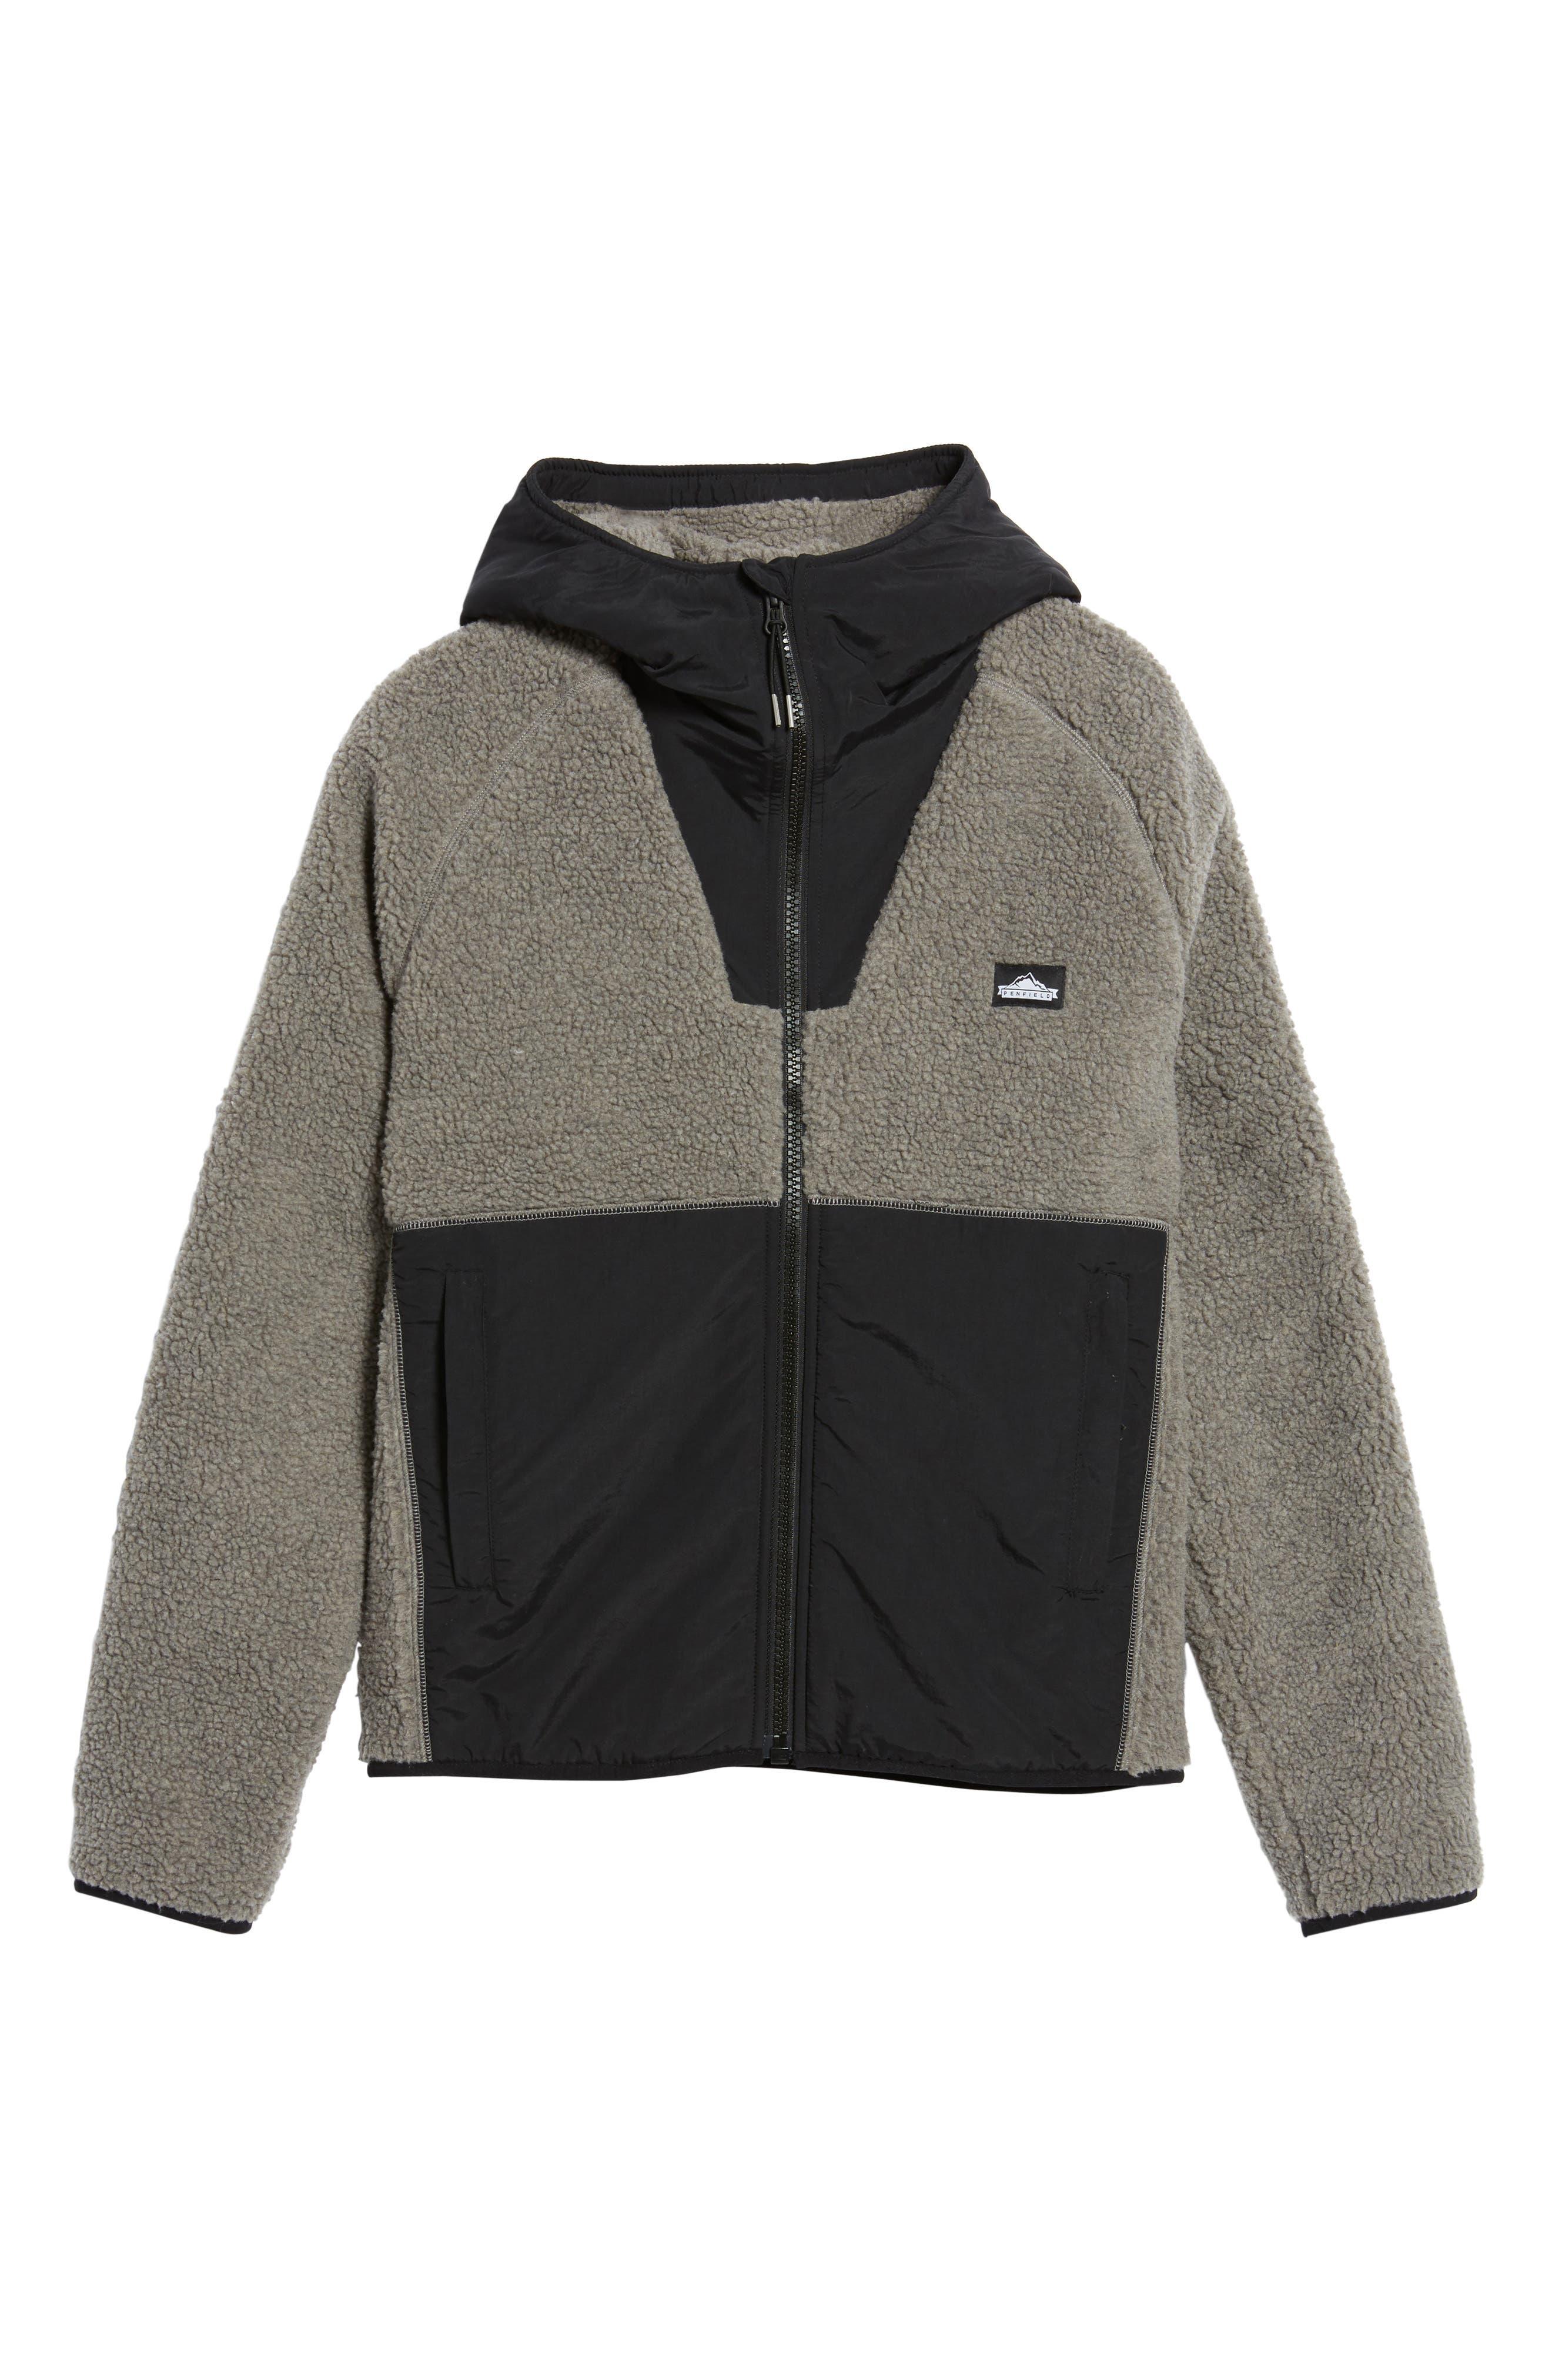 Vaughn Hooded Fleece Jacket,                             Alternate thumbnail 5, color,                             Grey